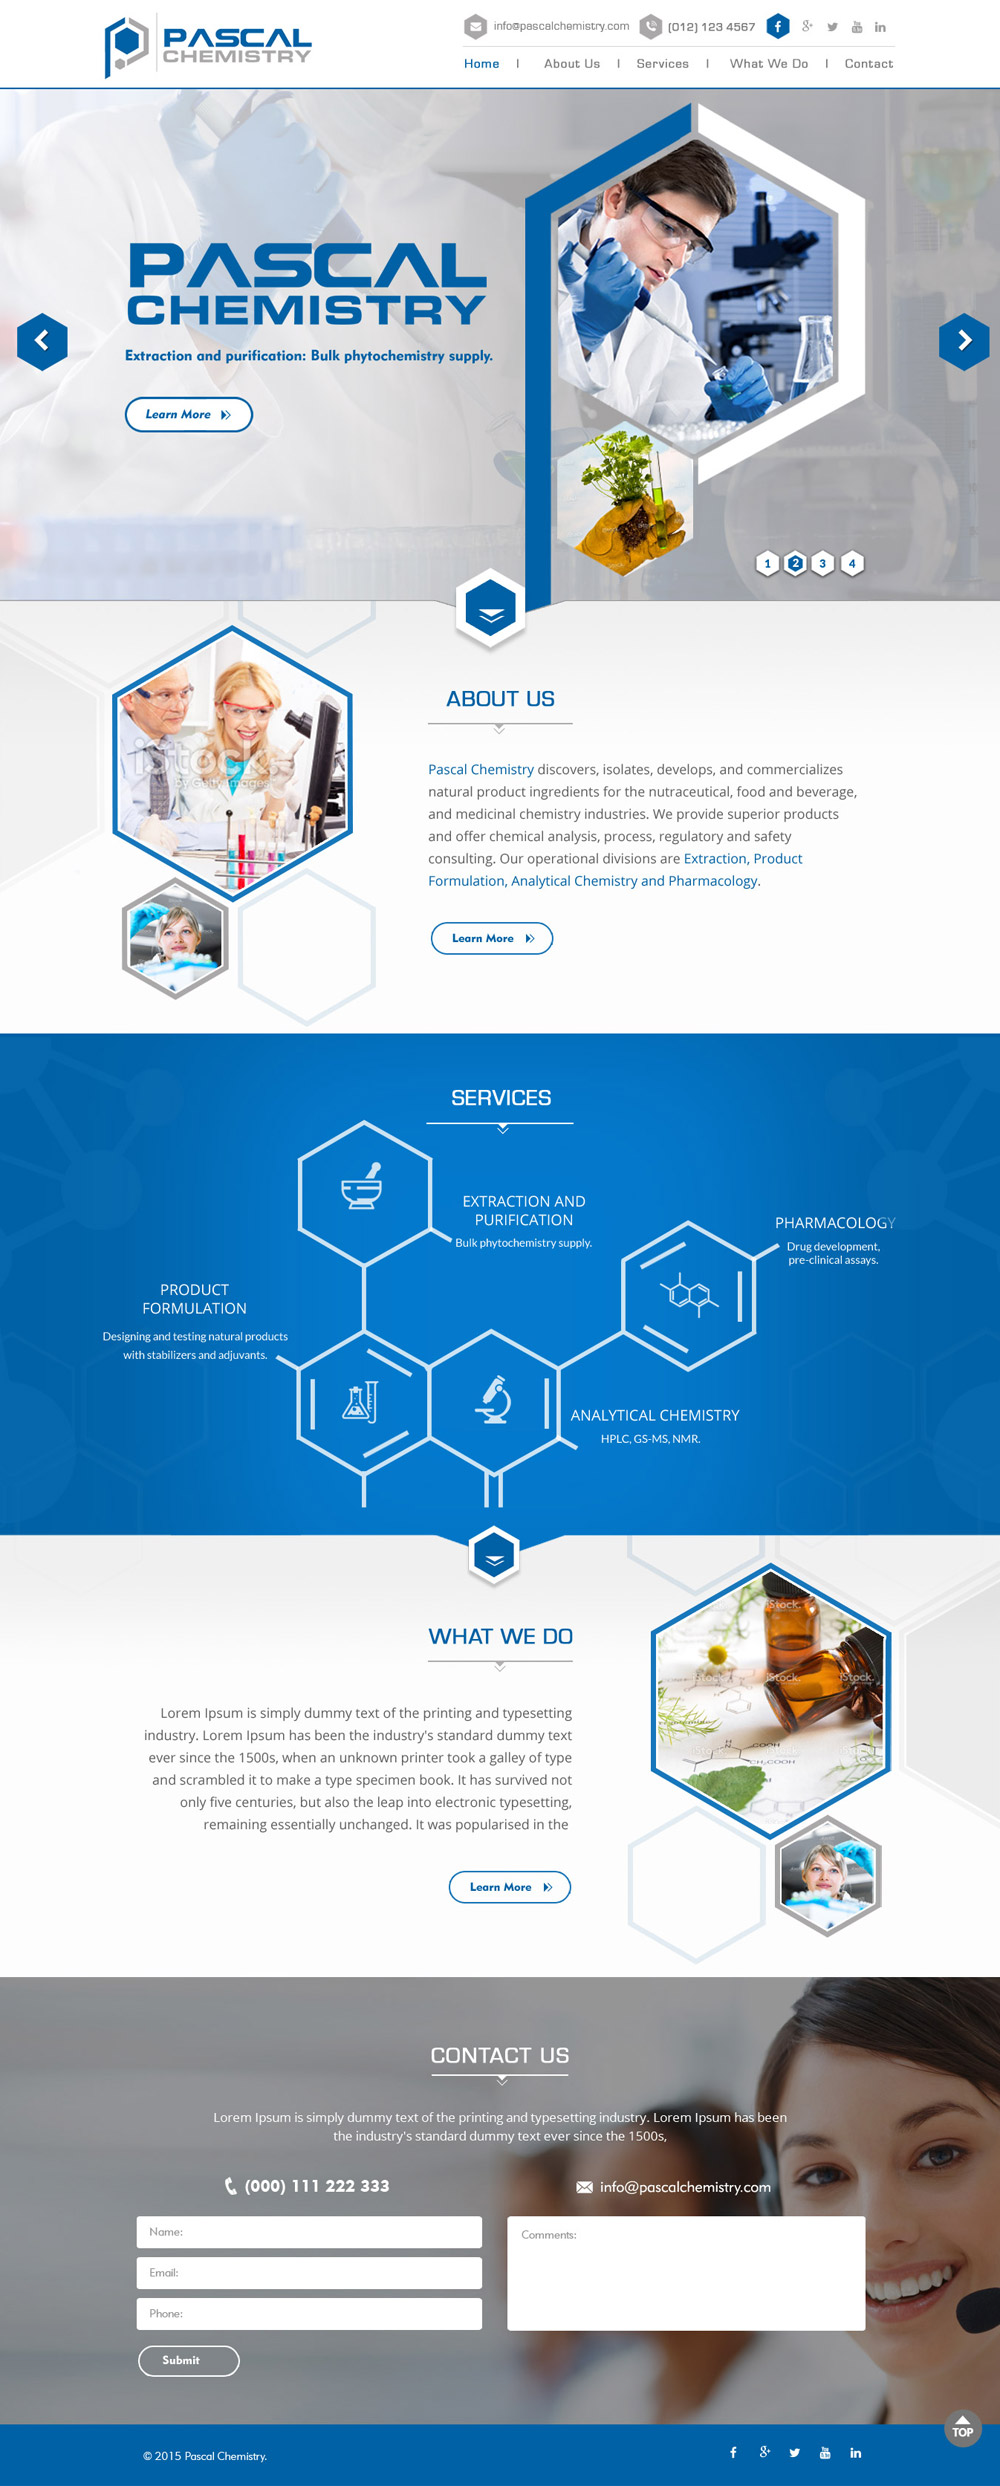 Pascal Chemistry web page logo design